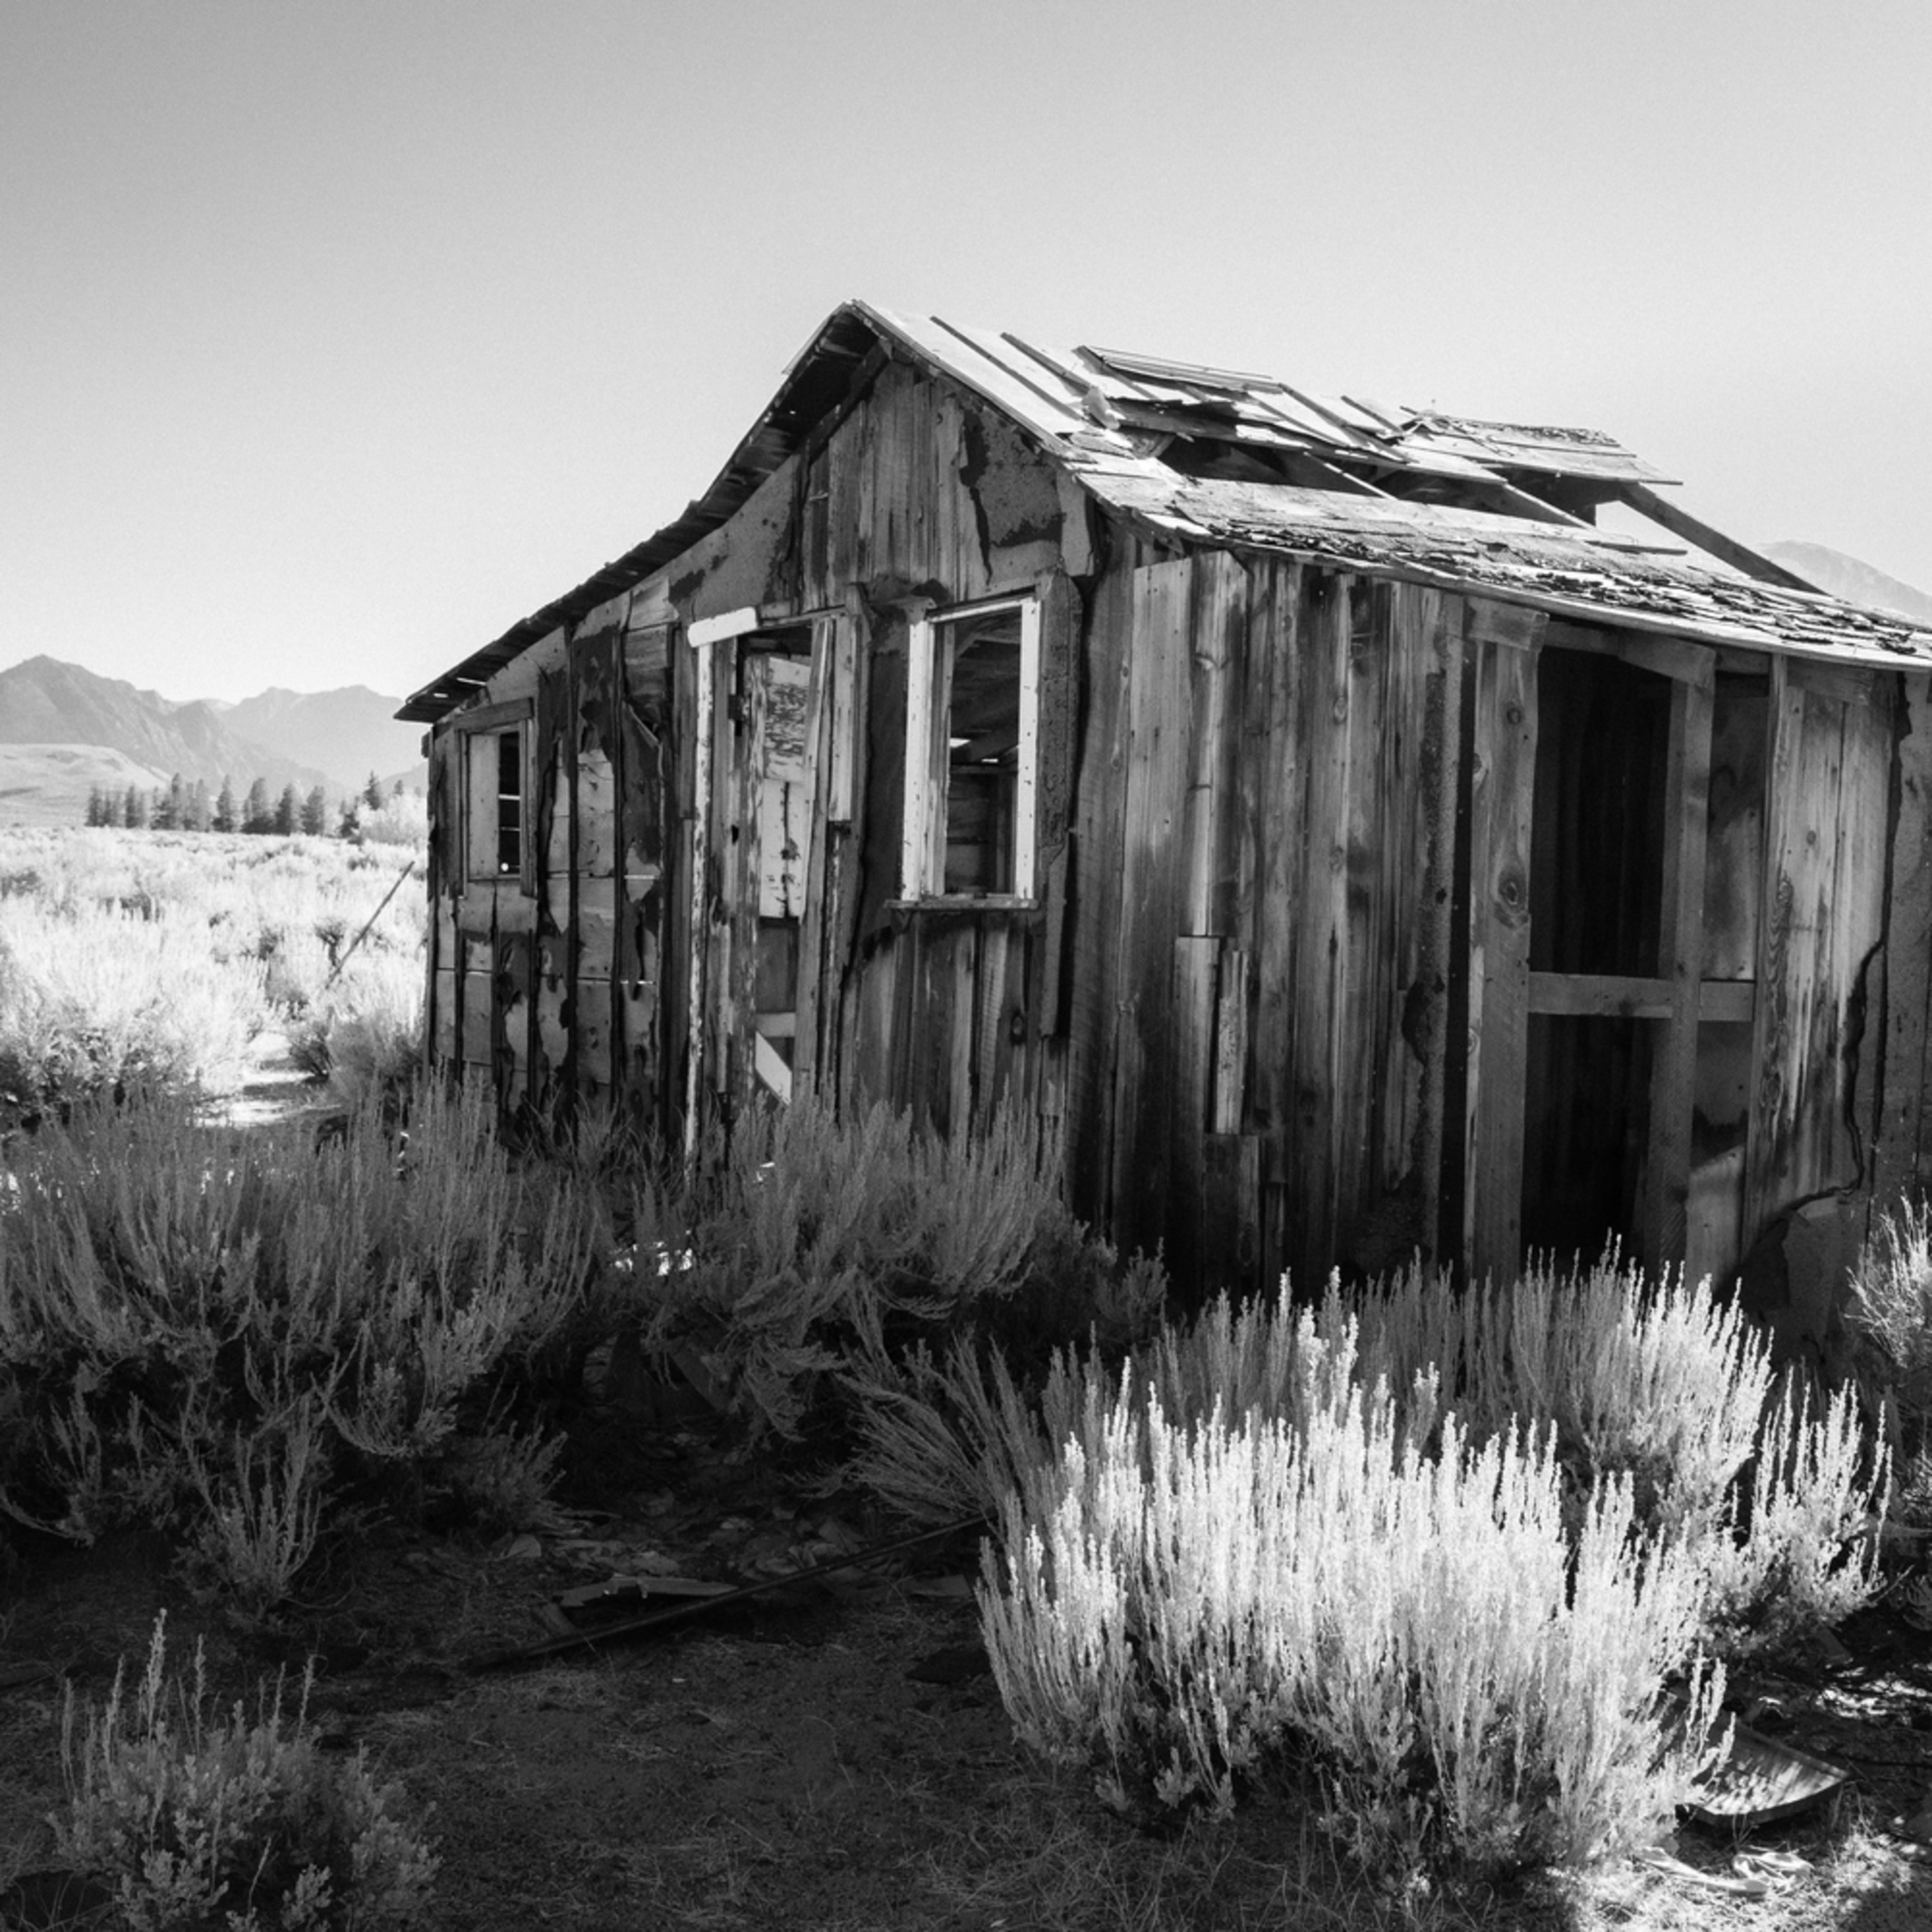 Desolation xq7qtn